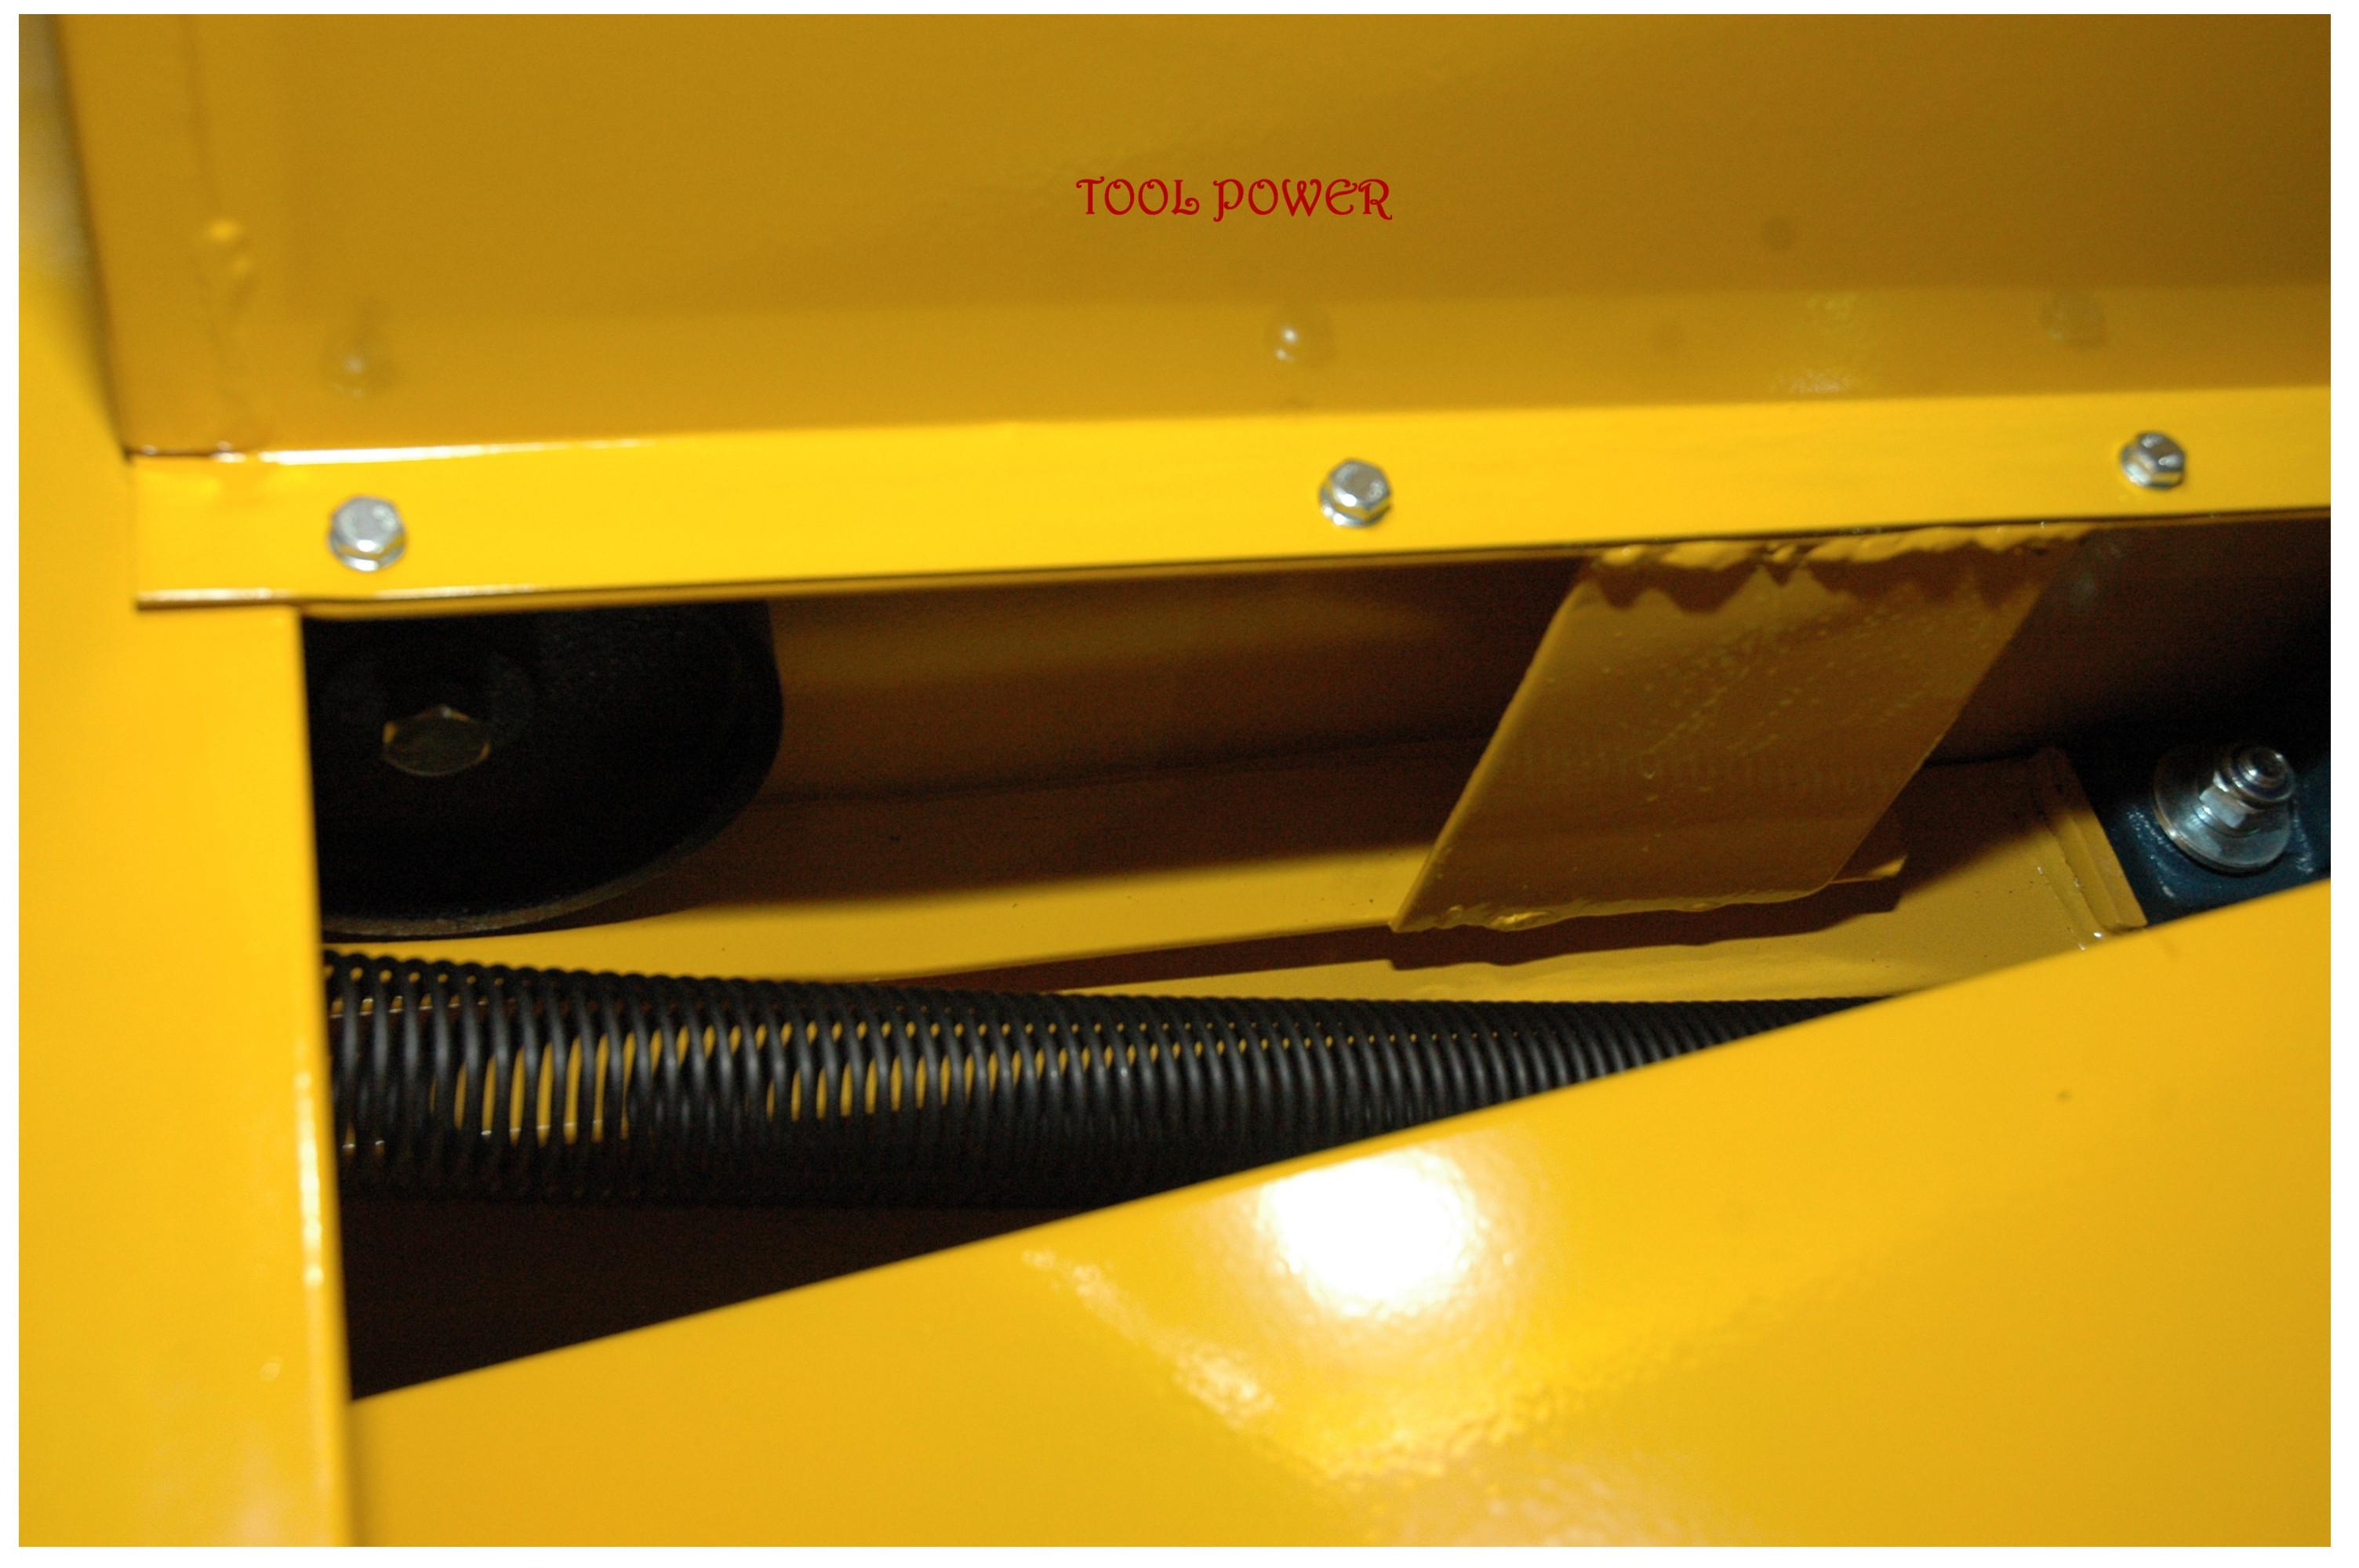 Fire wood log saw 36'' x 13-hp Low maintenance belt drive-1419